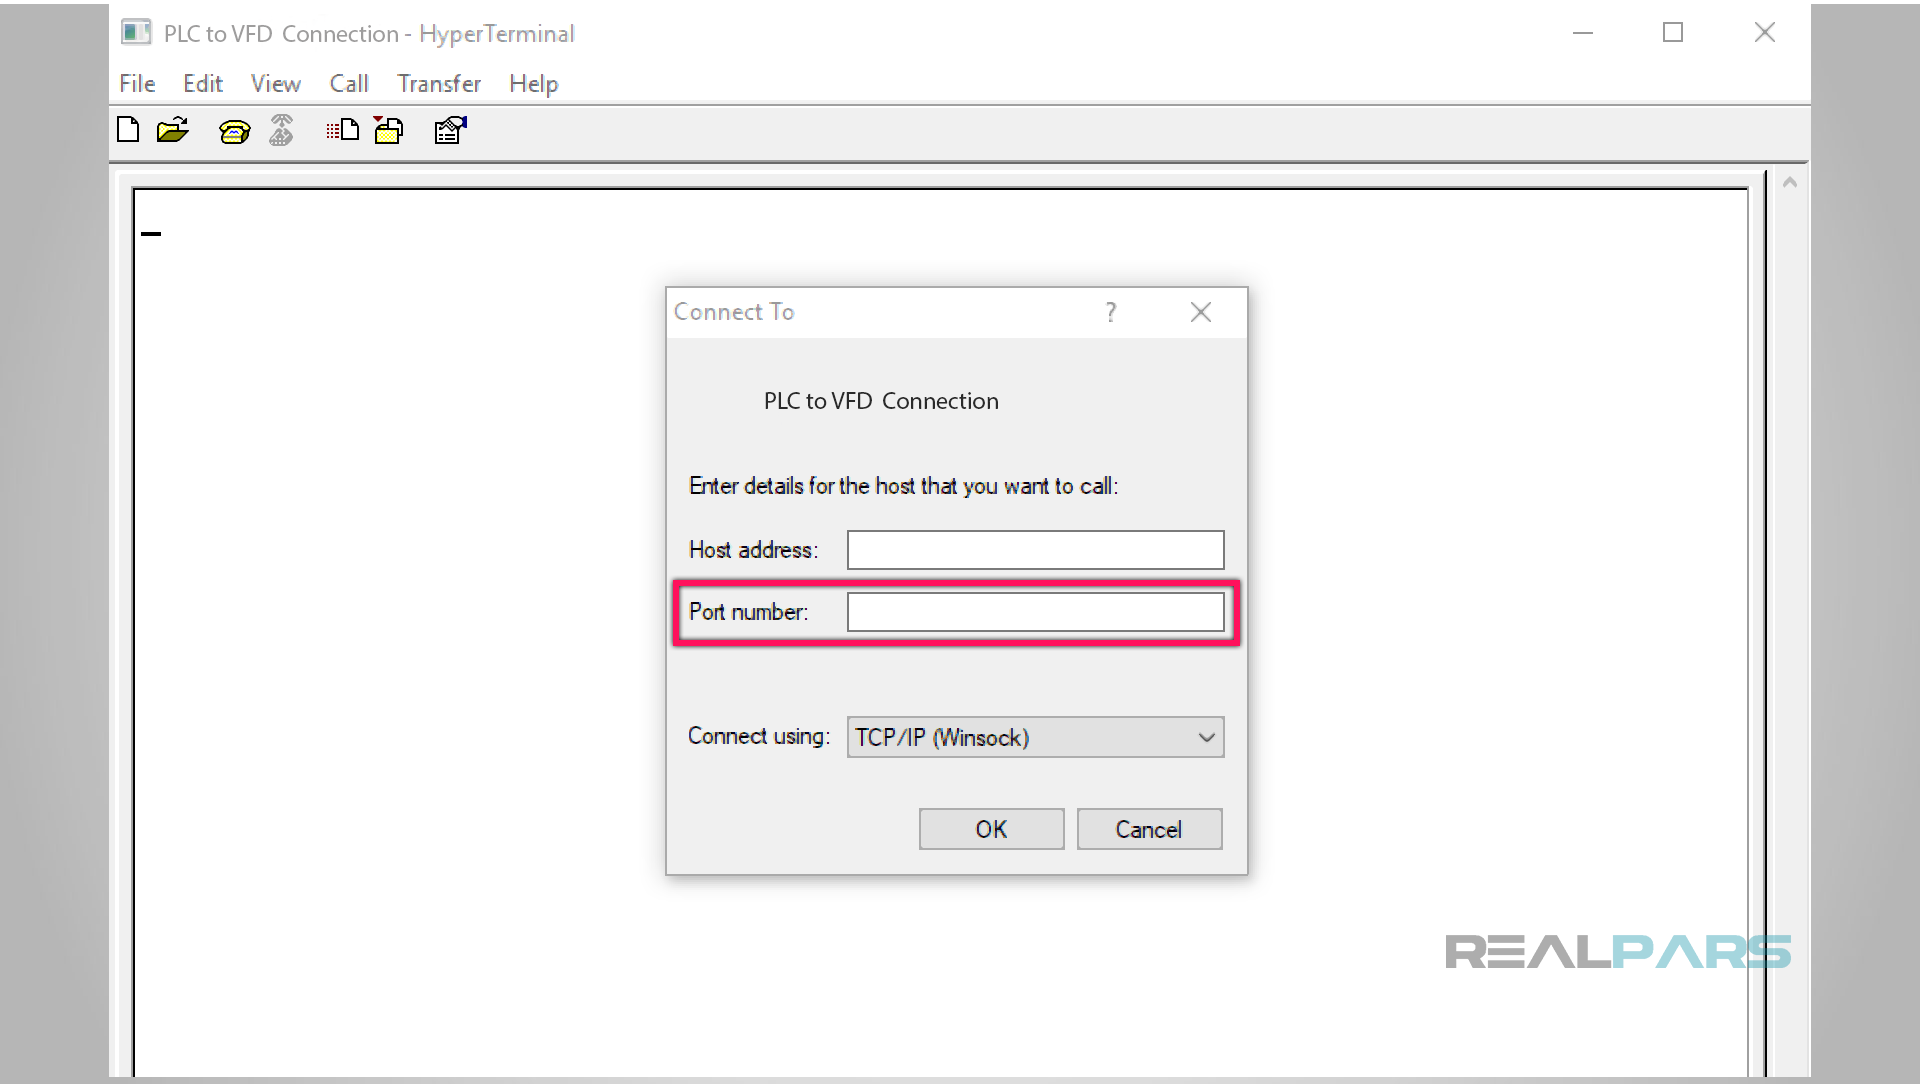 How to Control a VFD with a PLC - Part 1 (ControlLogix 5000